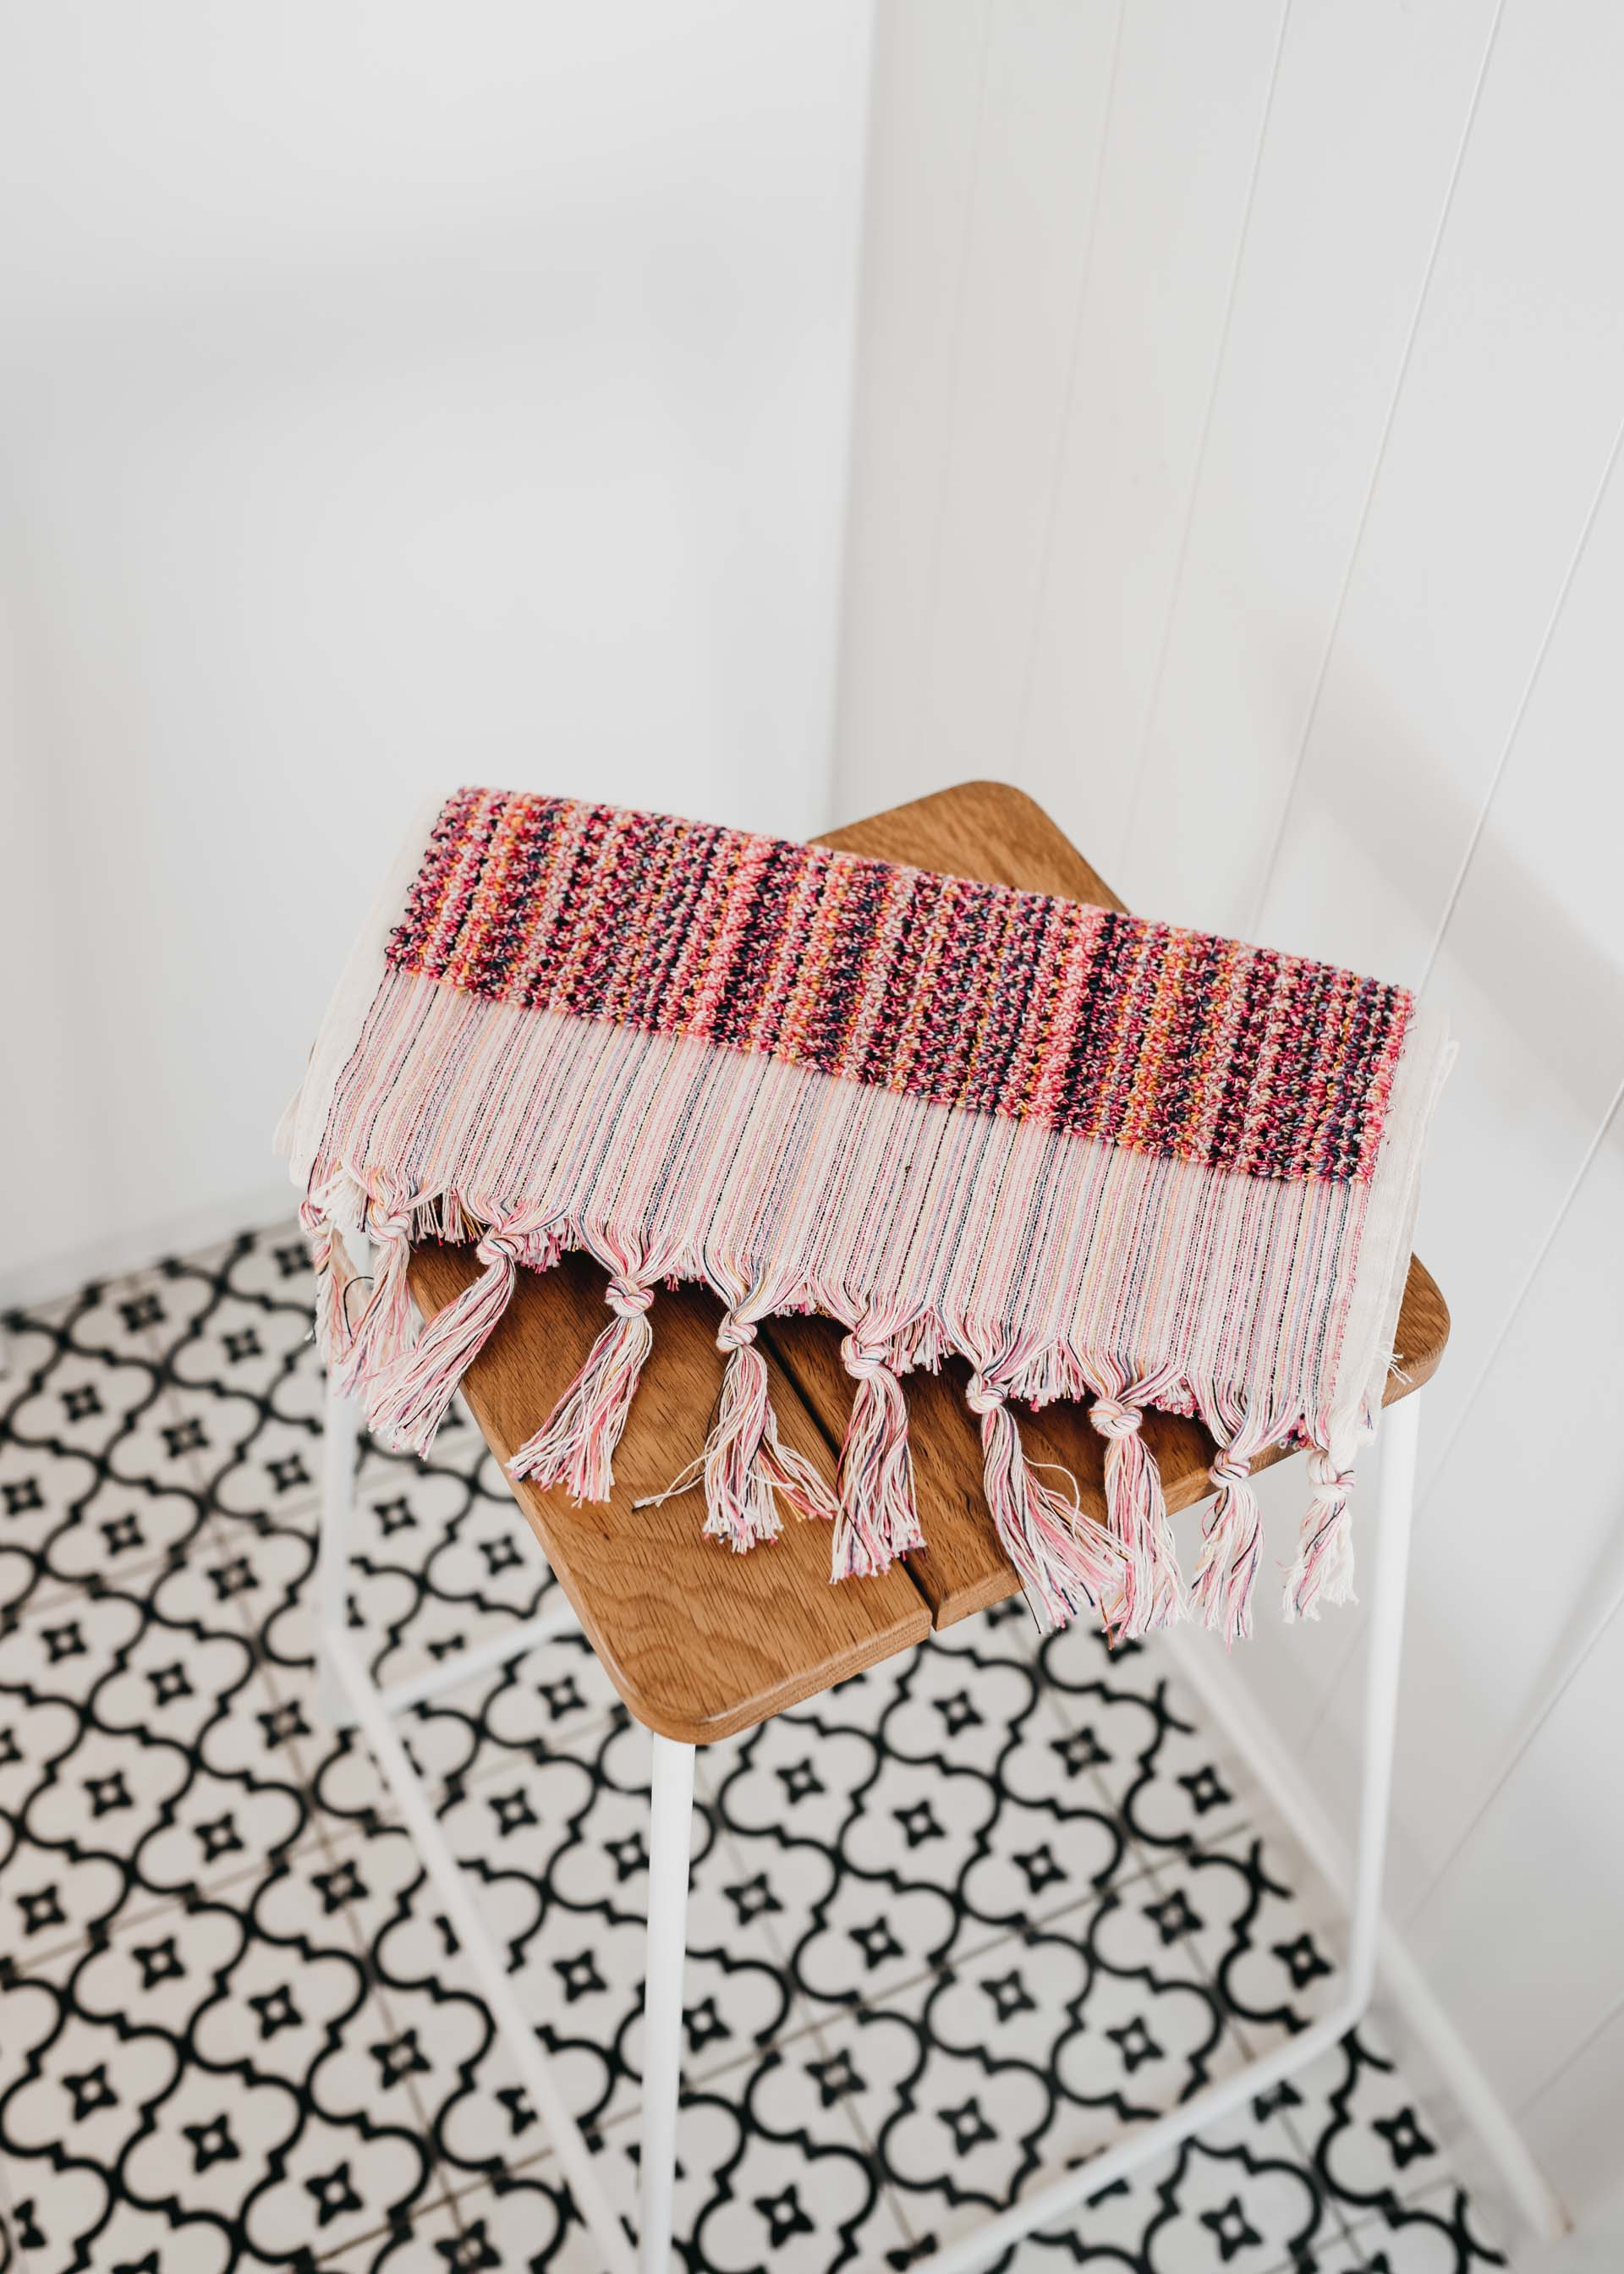 keira-mason-aegean-loom-towel.jpg